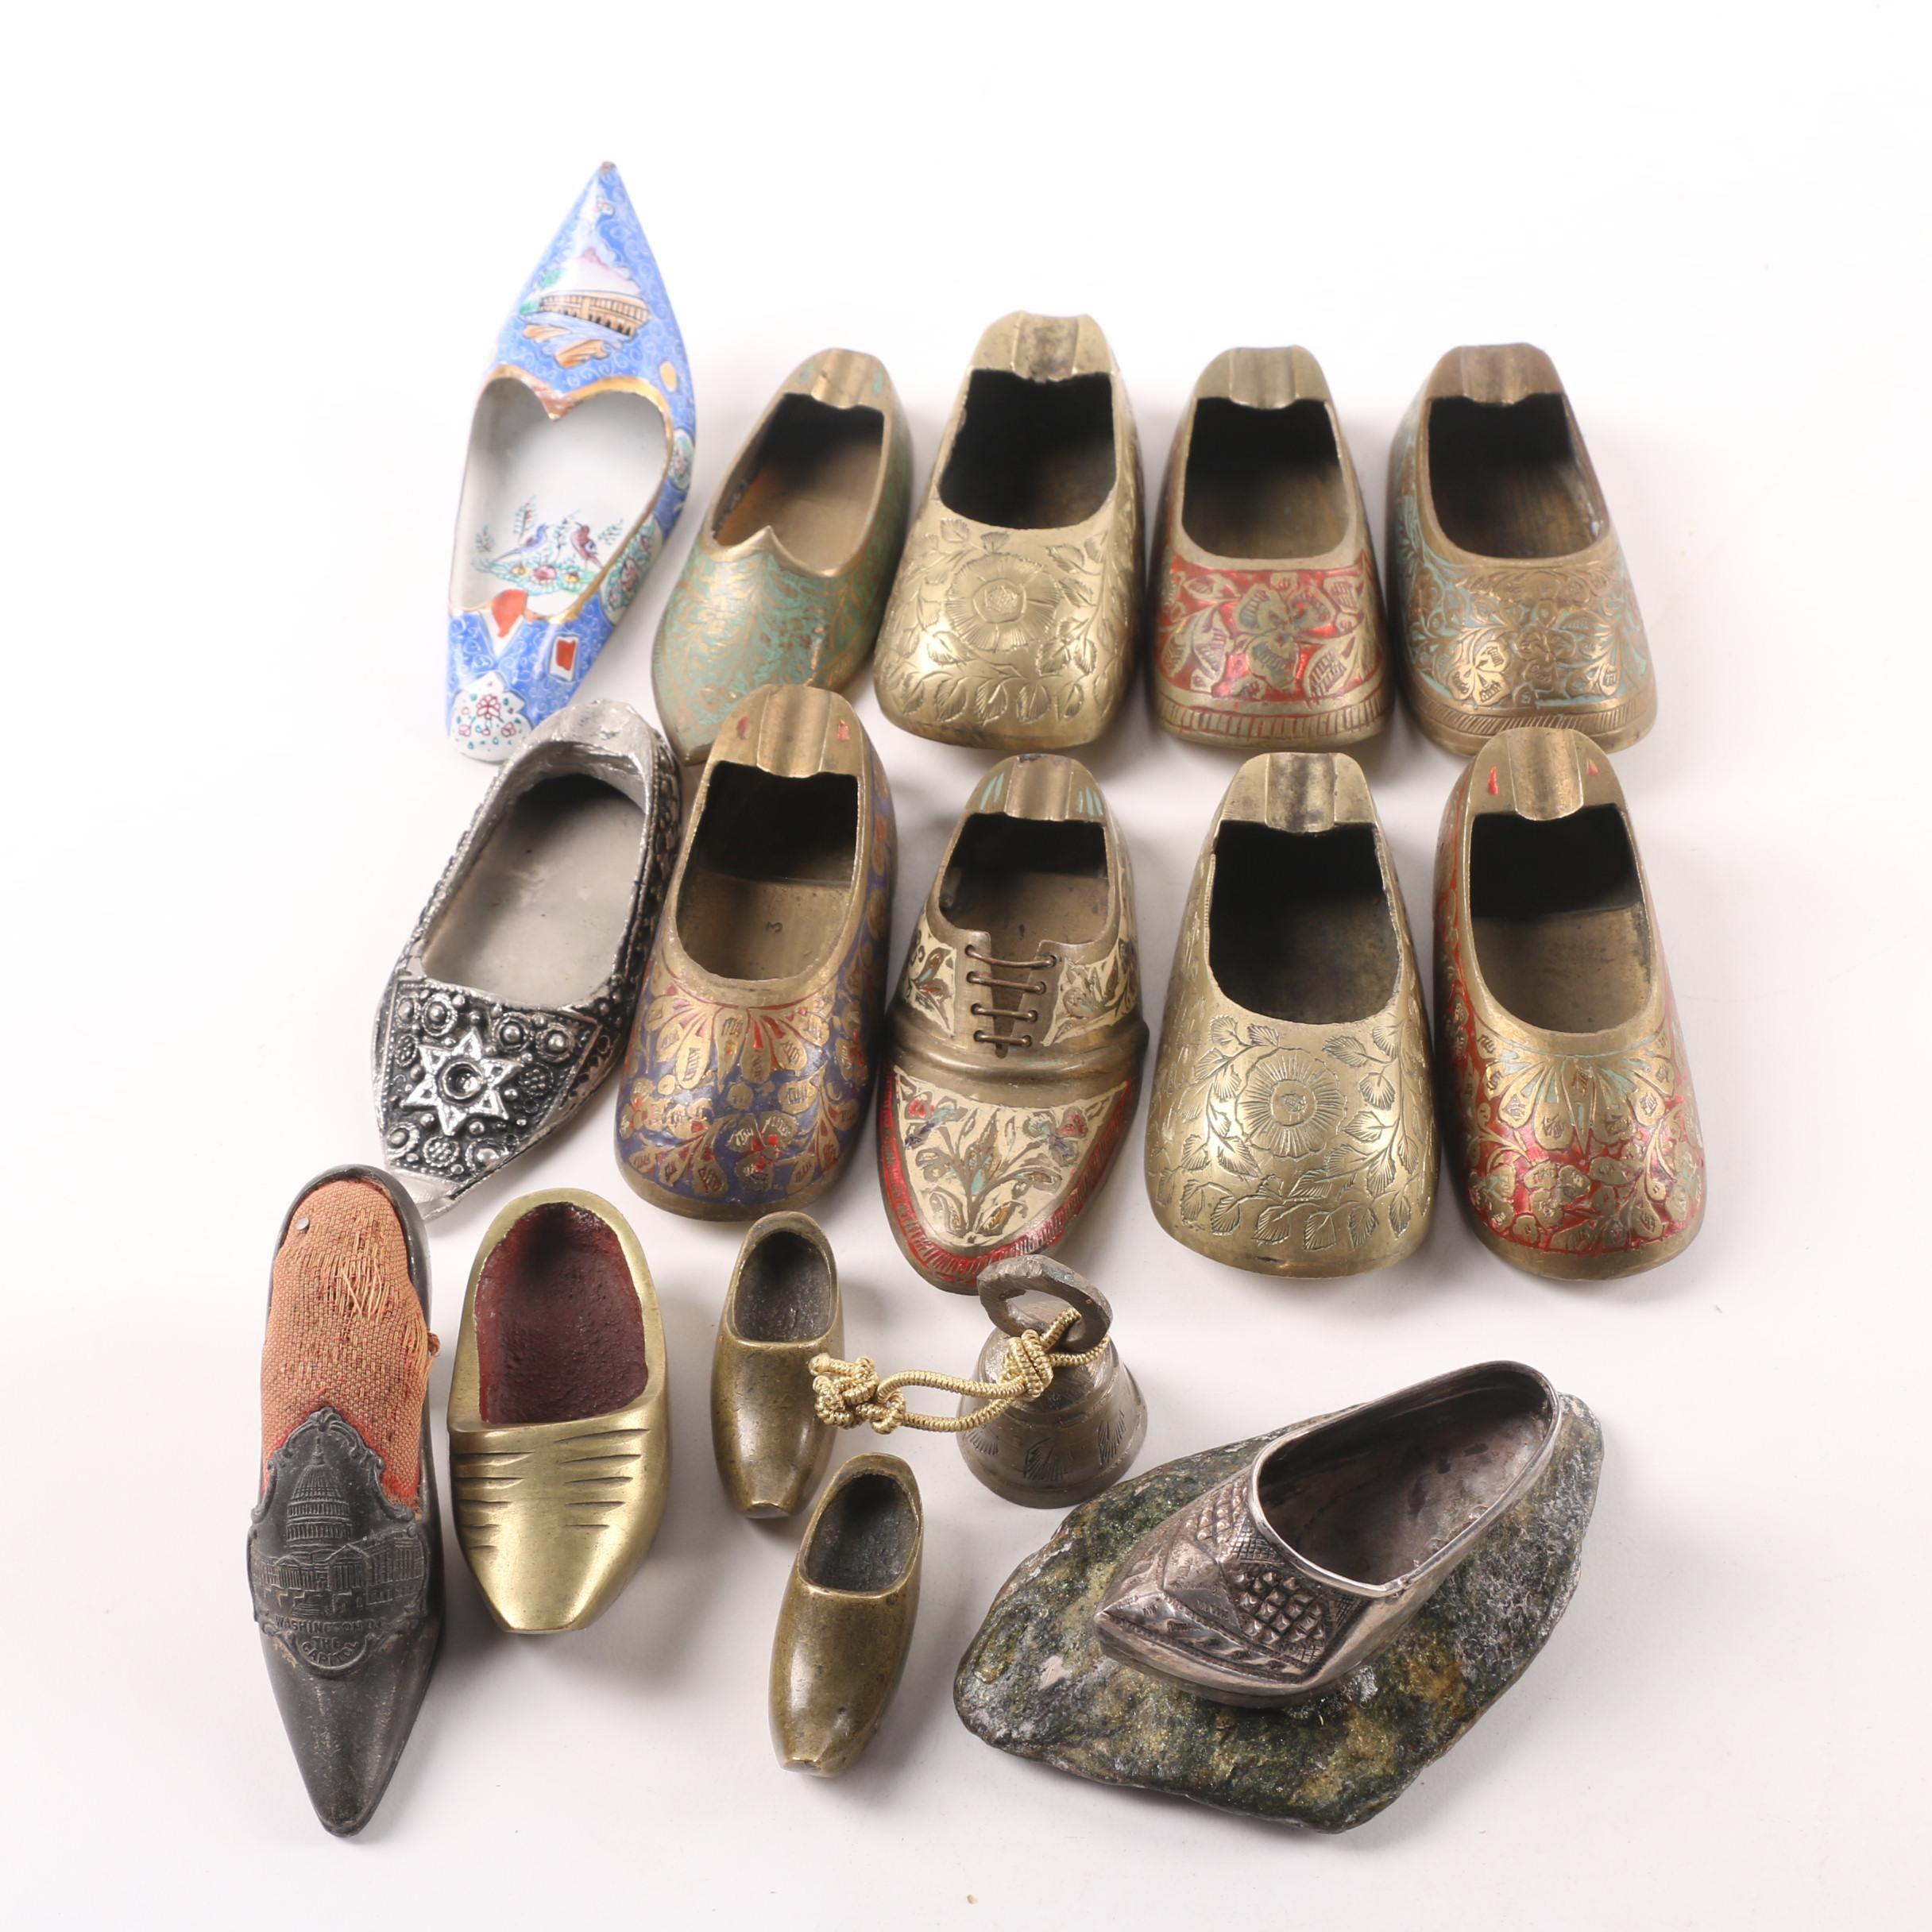 Vintage International Brass Shoe Figurines including India